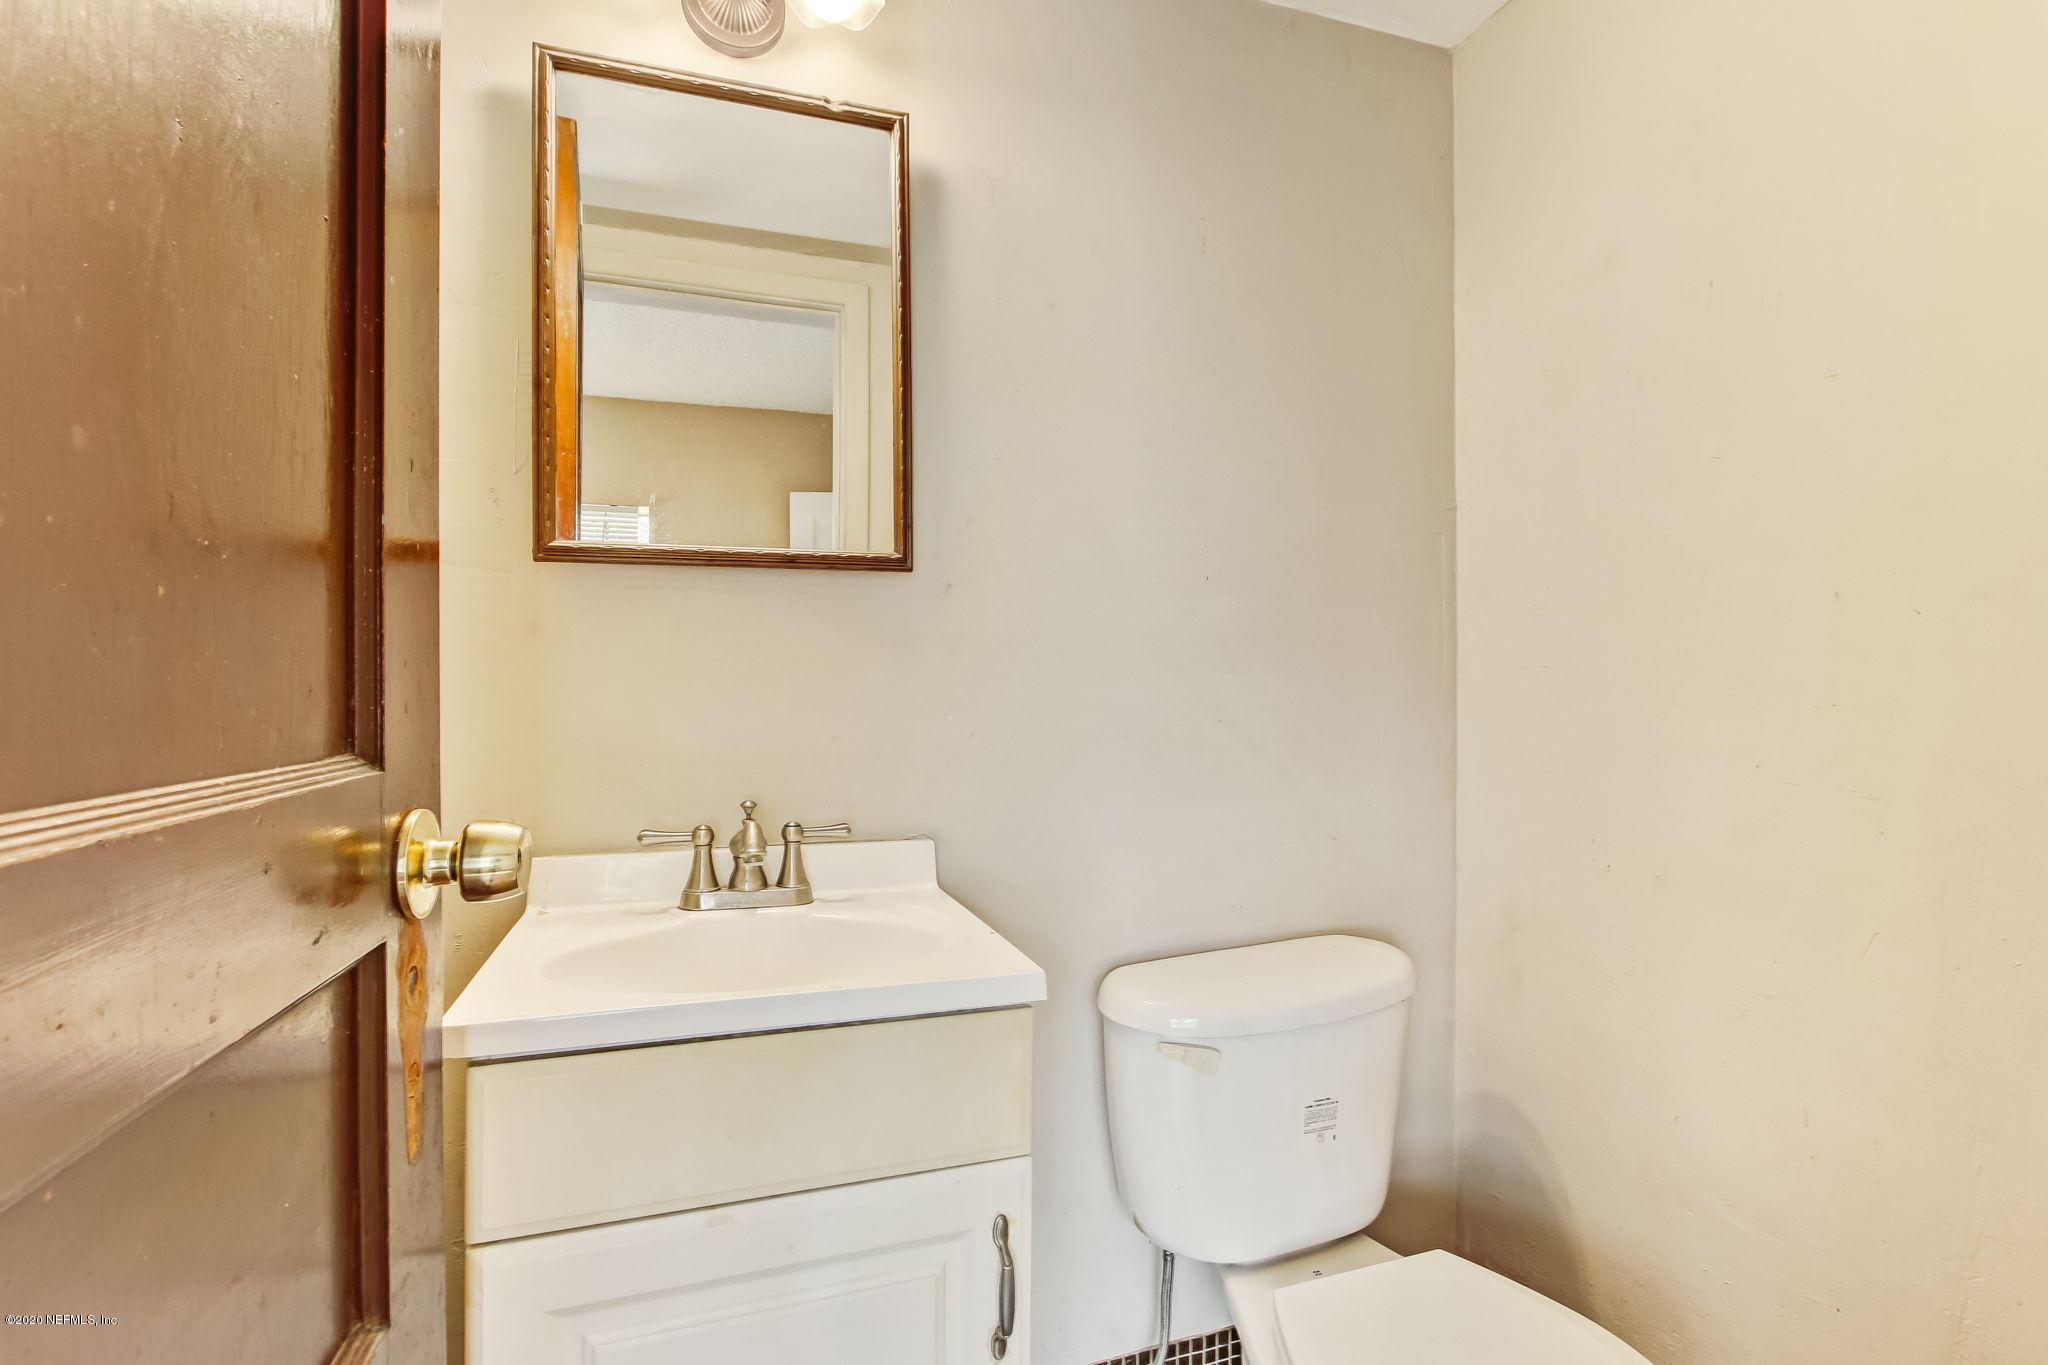 1716 ACADEMY, JACKSONVILLE, FLORIDA 32209, 4 Bedrooms Bedrooms, ,2 BathroomsBathrooms,Residential,For sale,ACADEMY,1079622